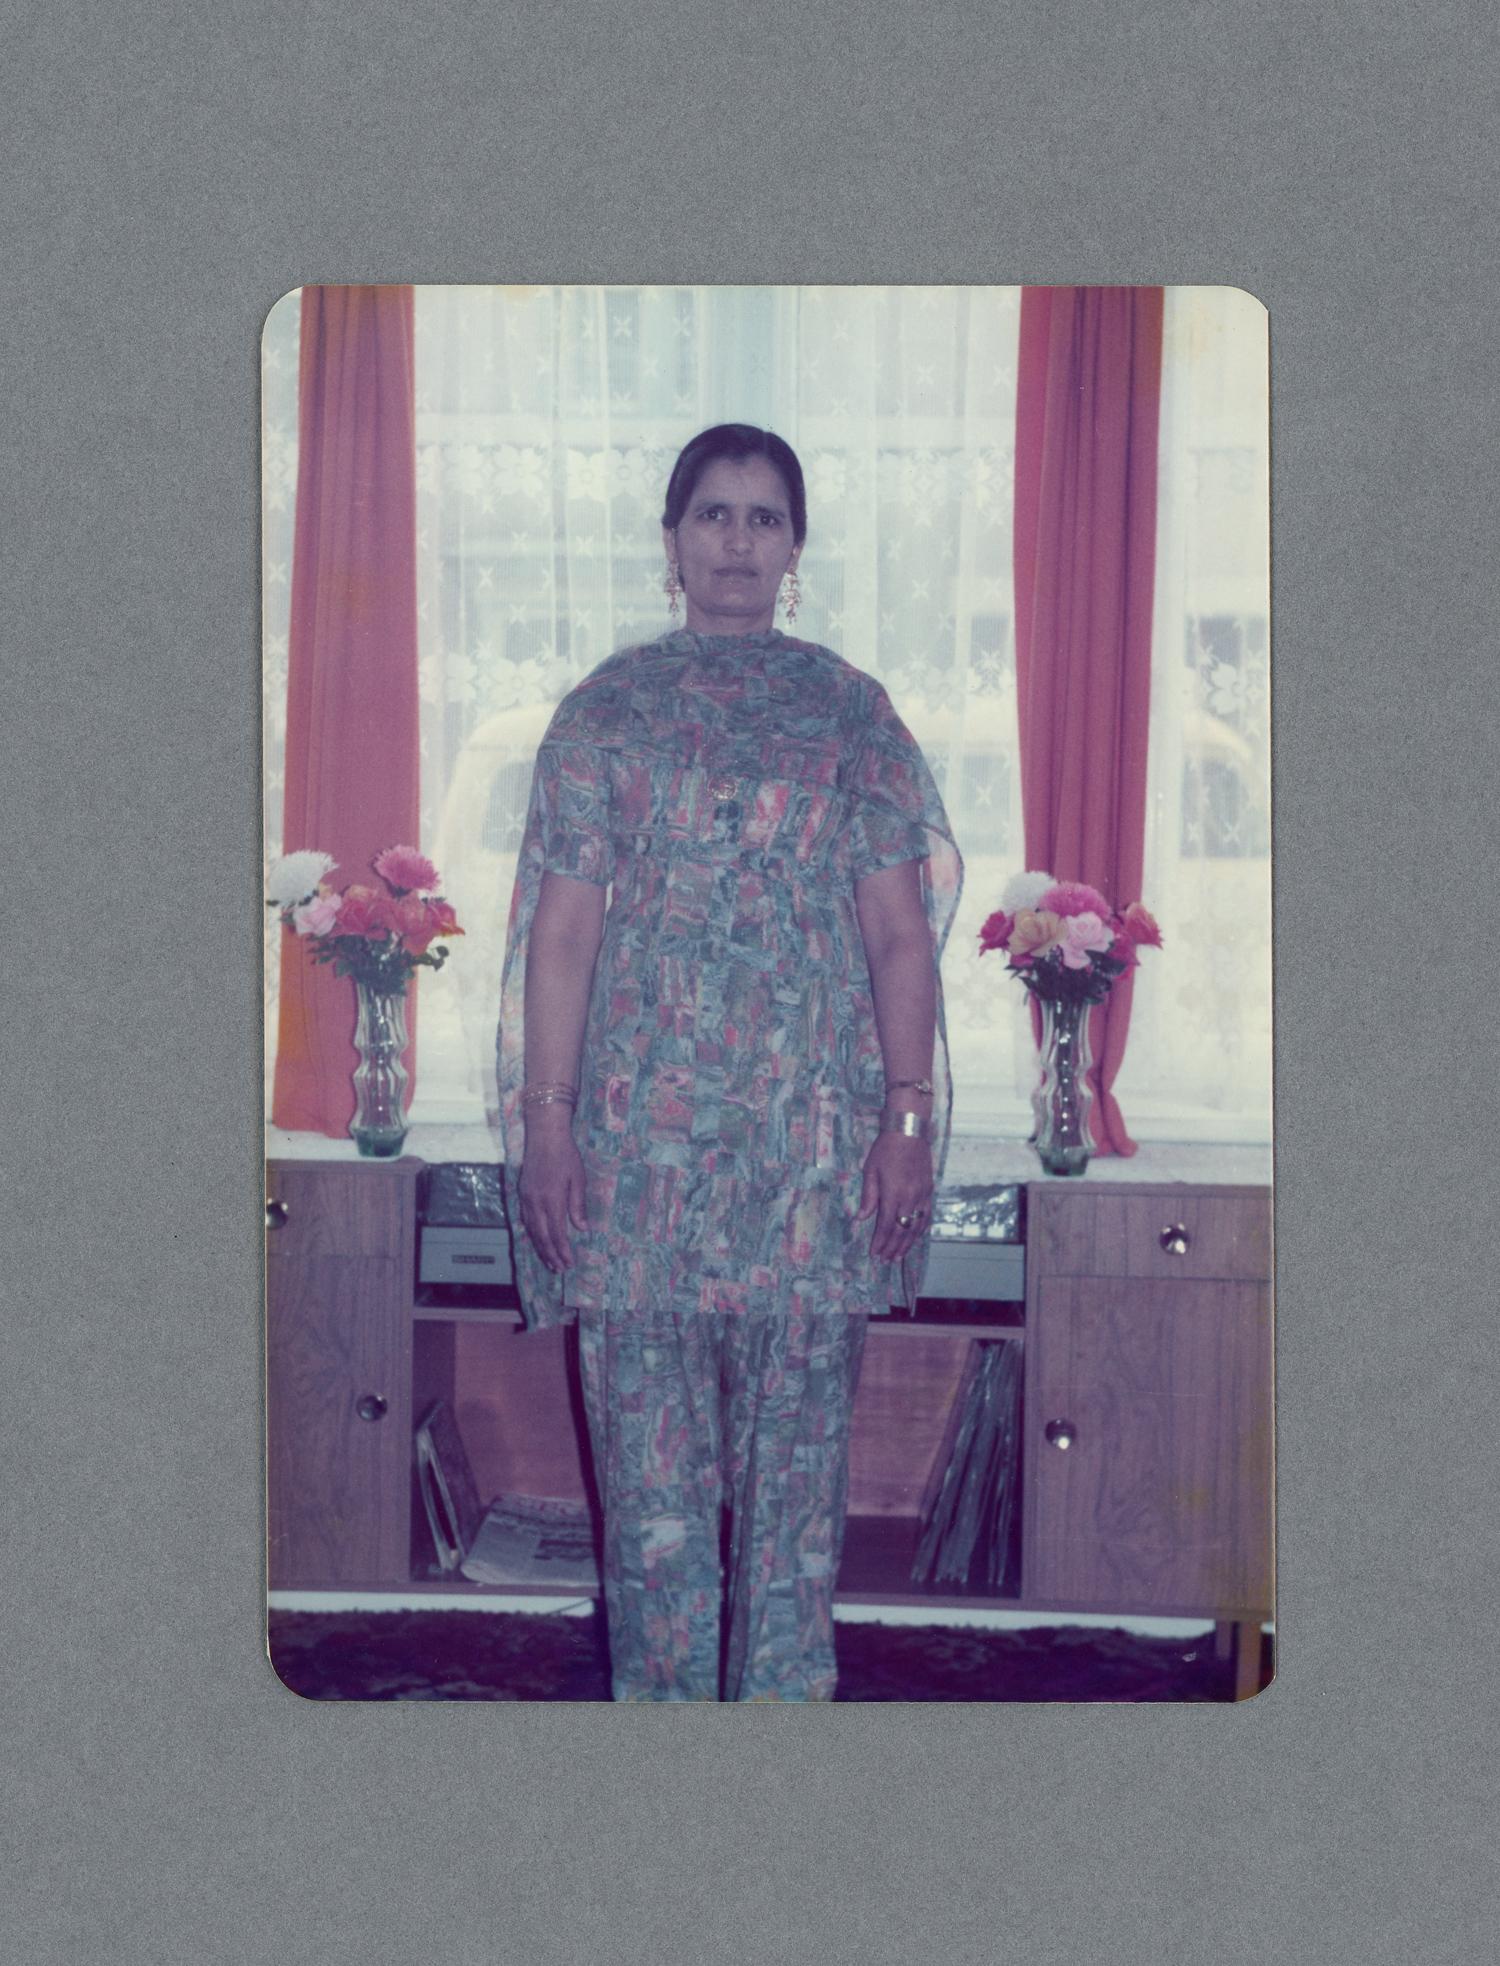 Rayleigh Rd. c.1979